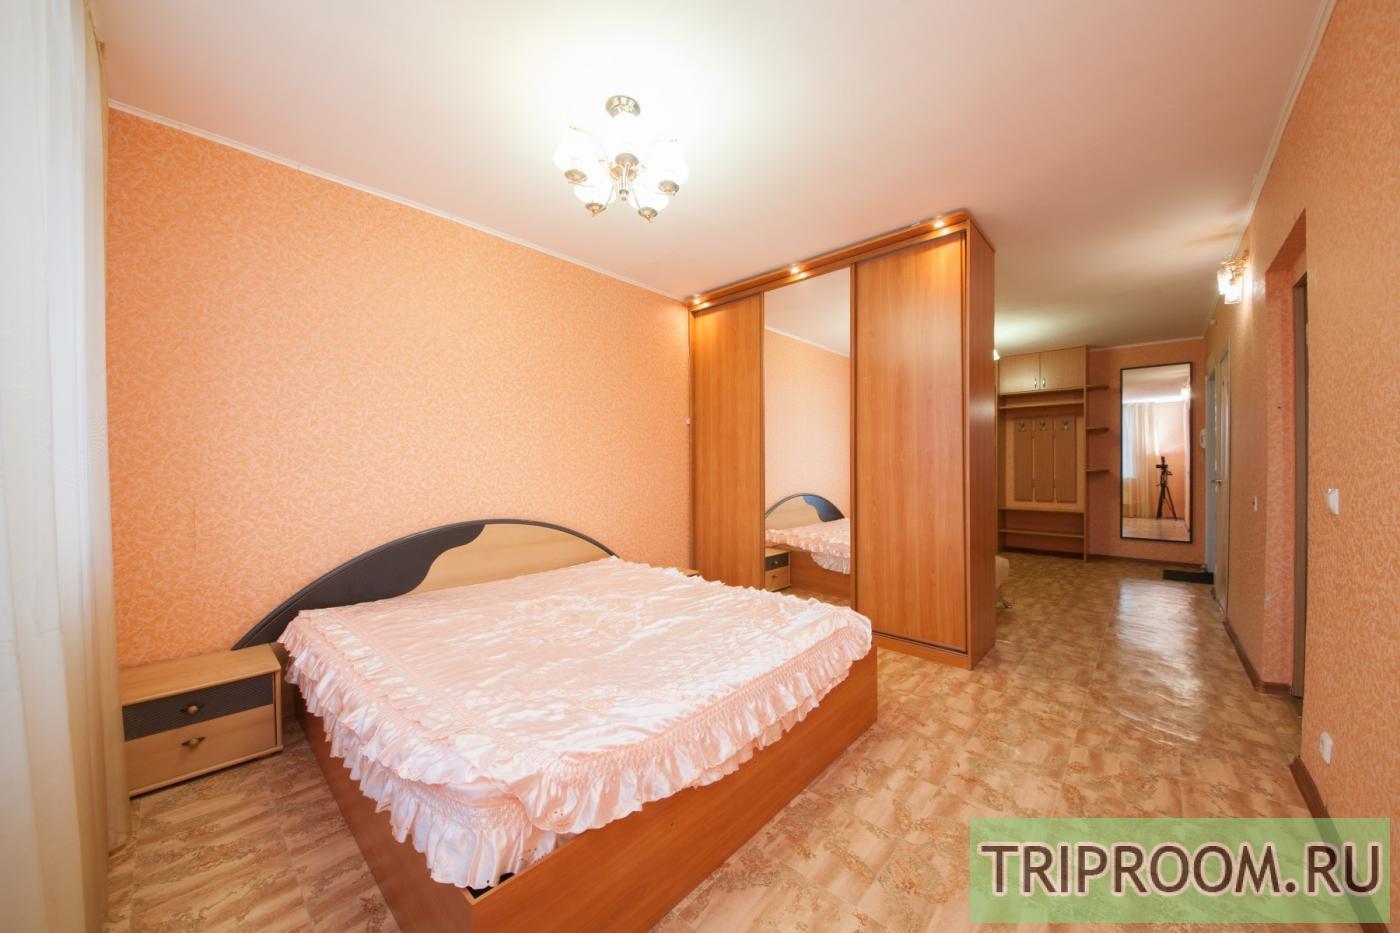 1-комнатная квартира посуточно (вариант № 35185), ул. Алексеева улица, фото № 1